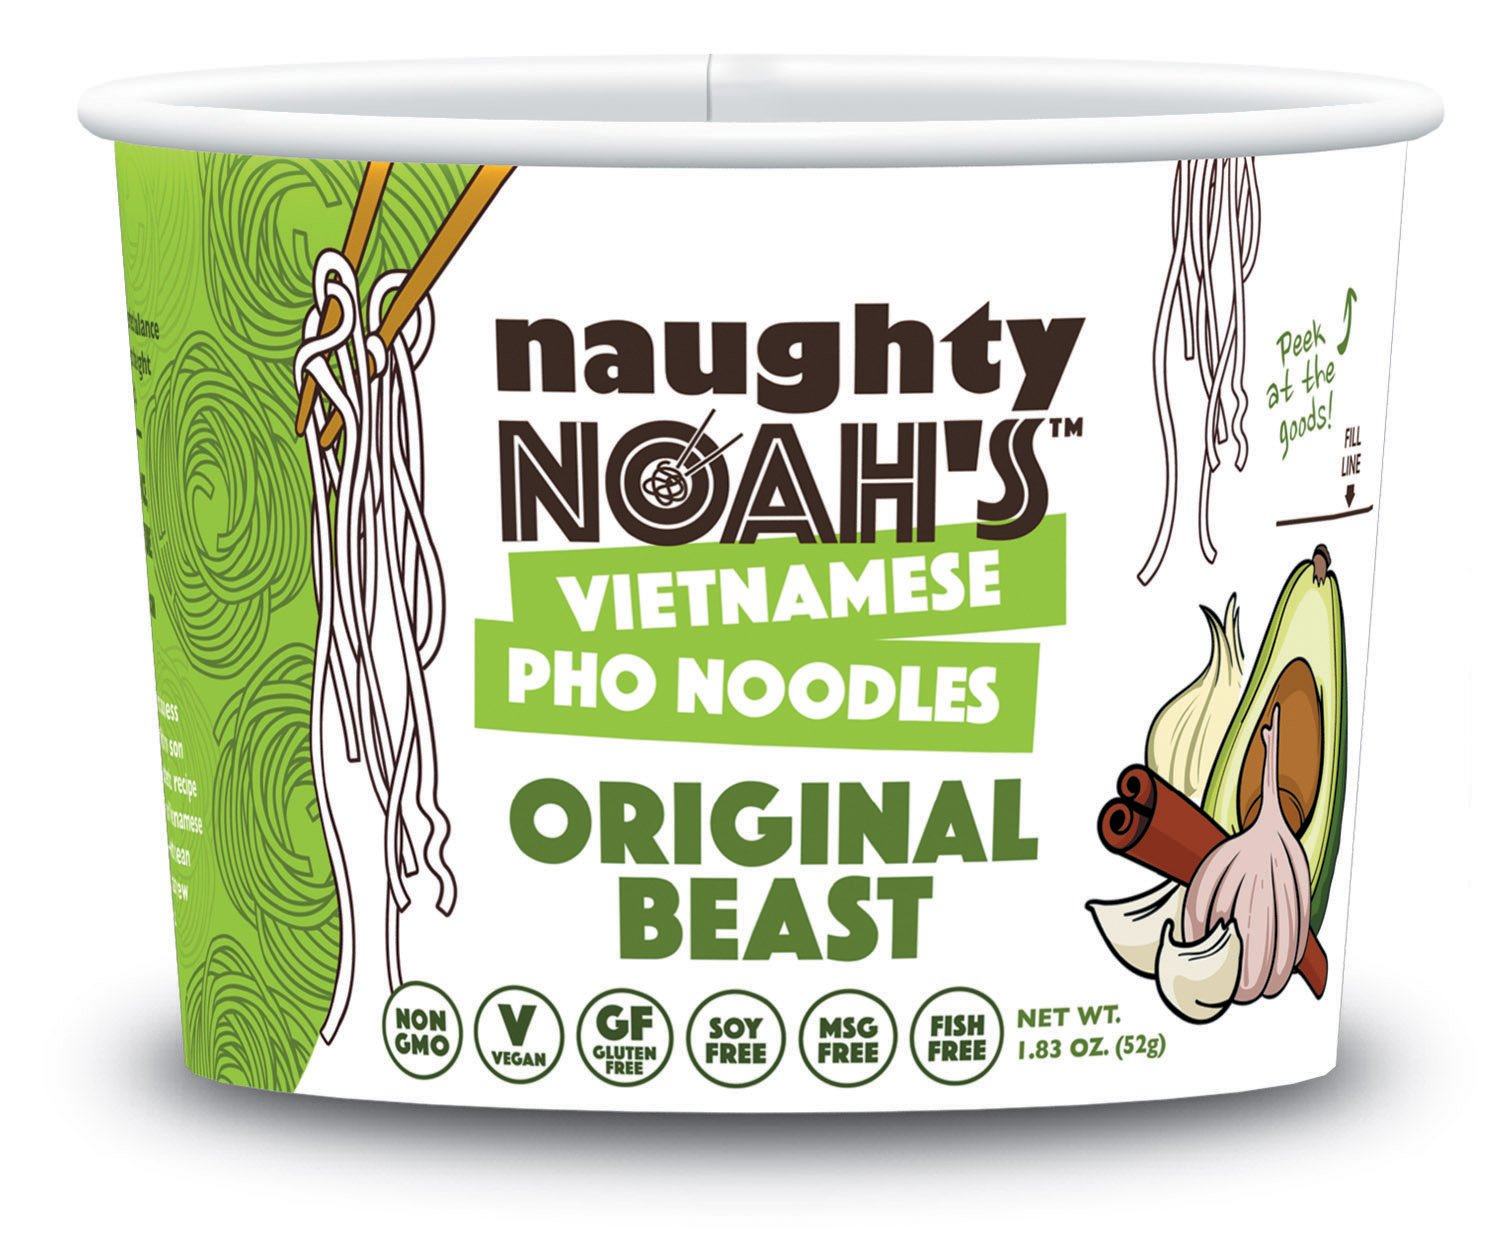 Naughty Noah's Vietnamese Pho Noodles | Original Beast Flavor (6-pack) | Vegan | Non-GMO | Noodle Bowl